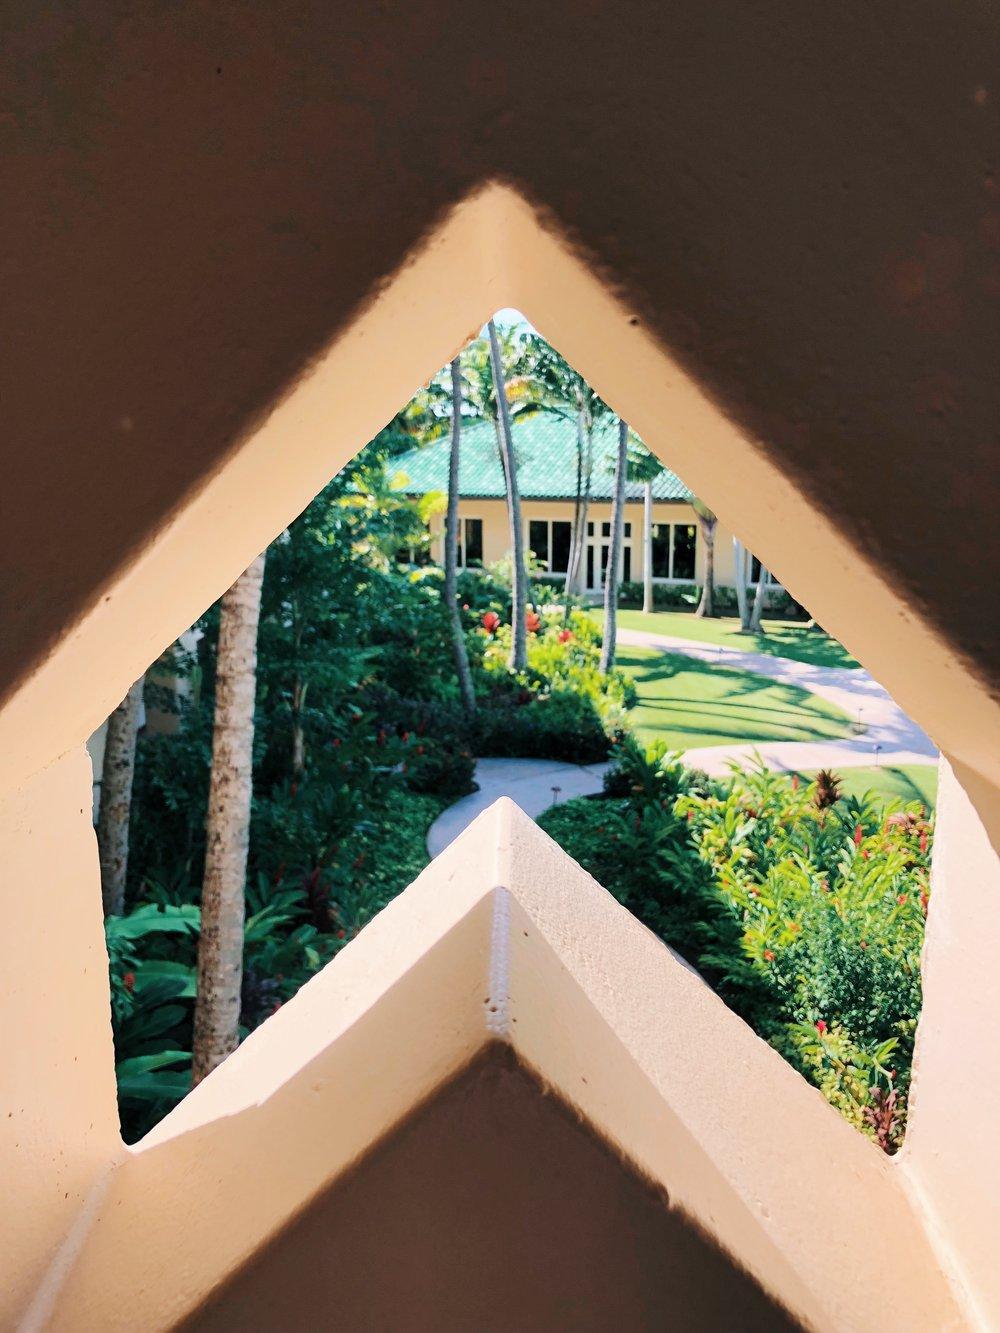 Review of Grand Hyatt Kauai Anara Spa